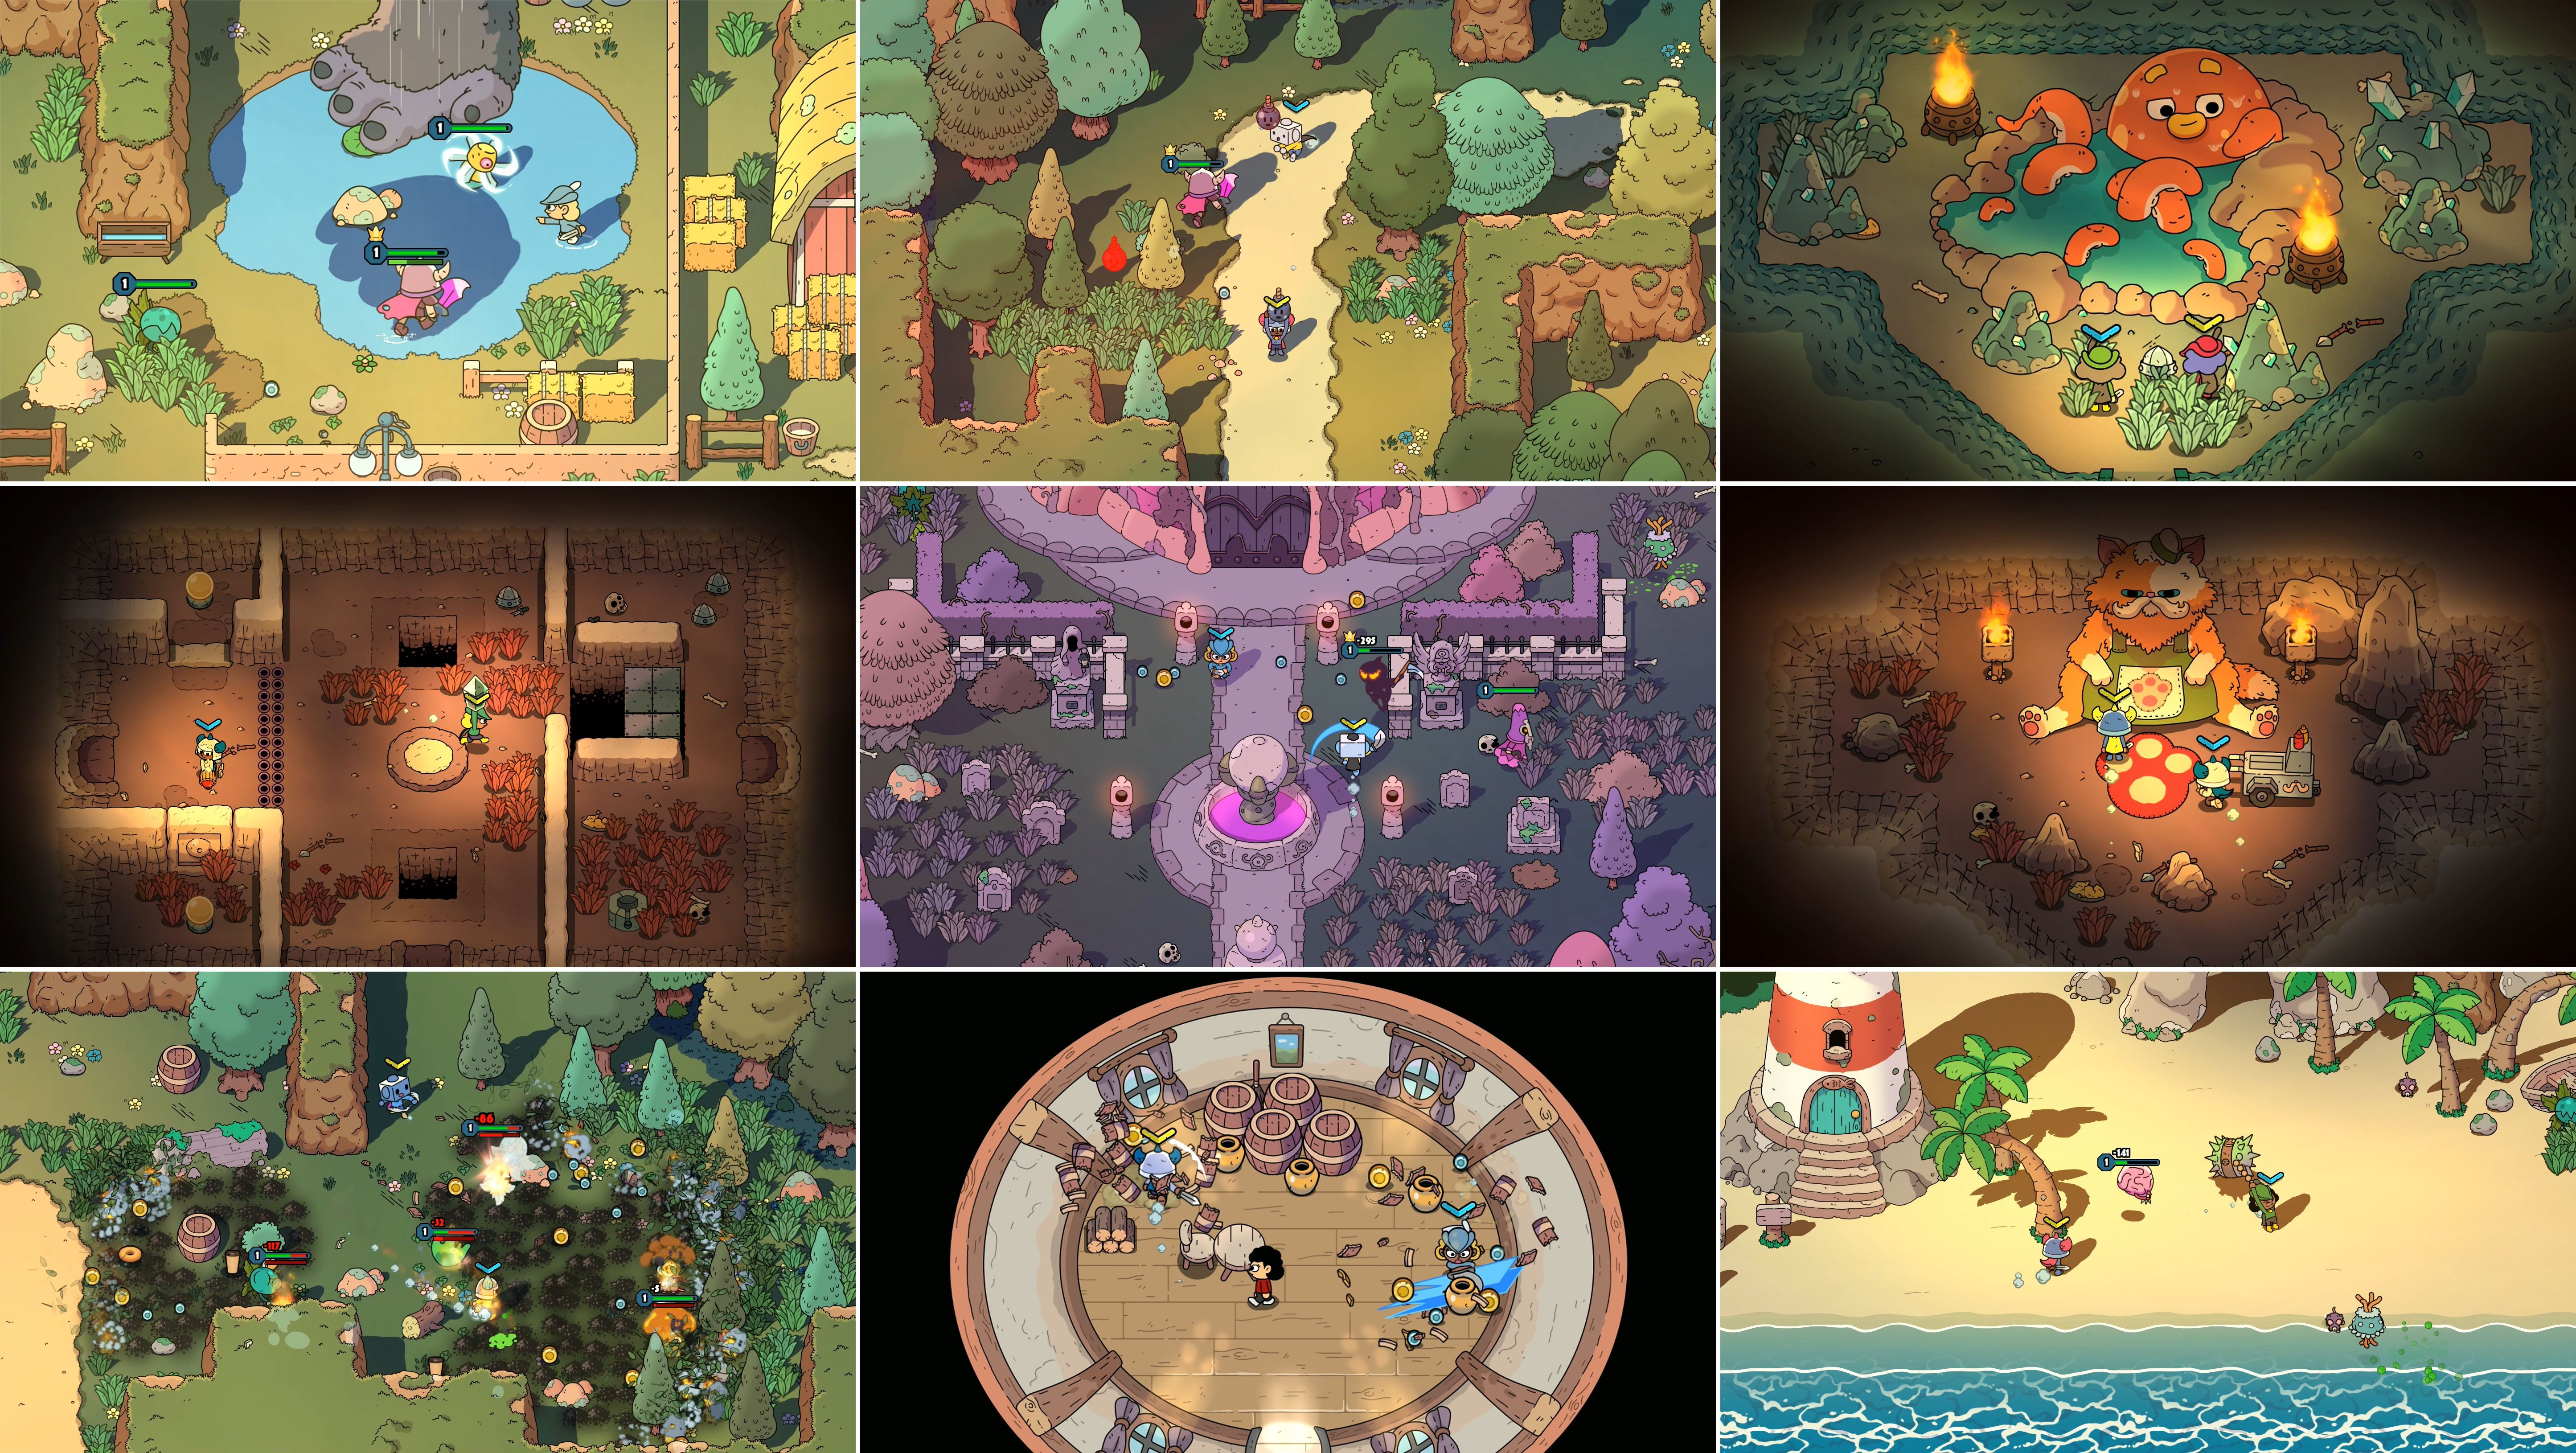 images?q=tbn:ANd9GcQh_l3eQ5xwiPy07kGEXjmjgmBKBRB7H2mRxCGhv1tFWg5c_mWT Trends For Awesome Internet Games @koolgadgetz.com.info